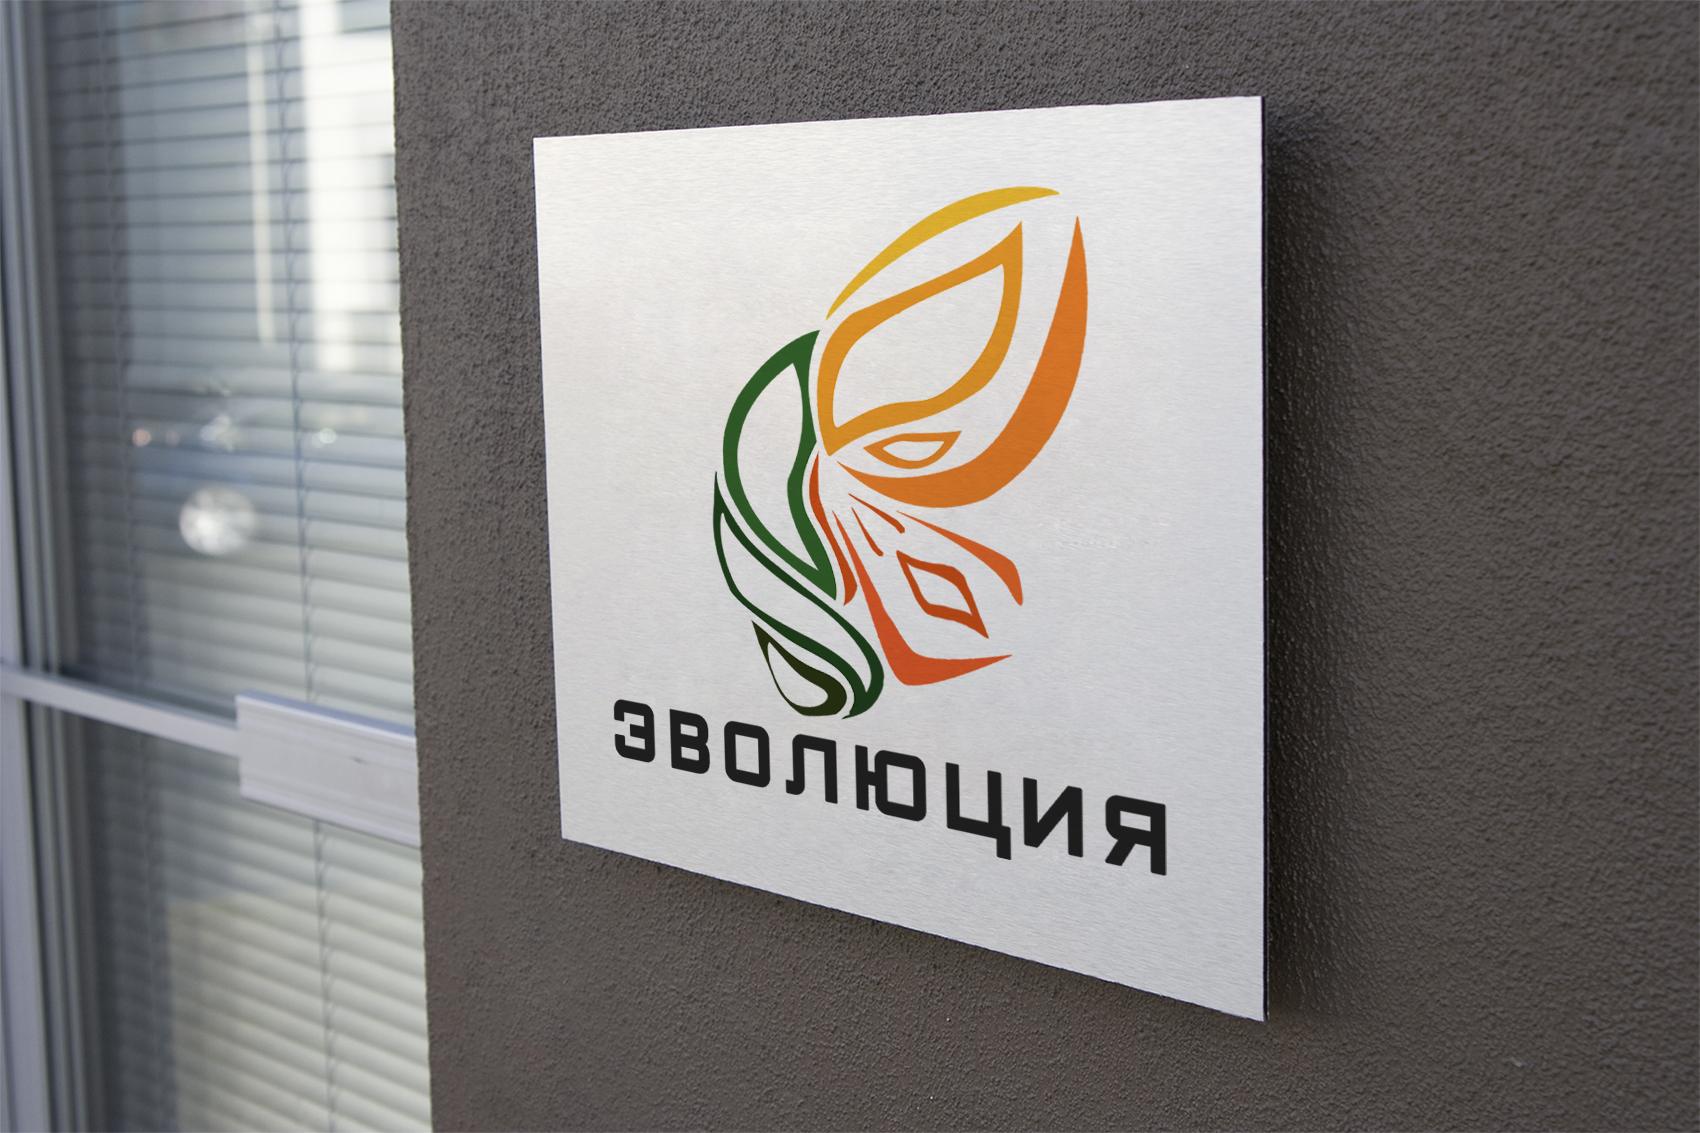 Разработать логотип для Онлайн-школы и сообщества фото f_7625bc7e1966b7b9.jpg